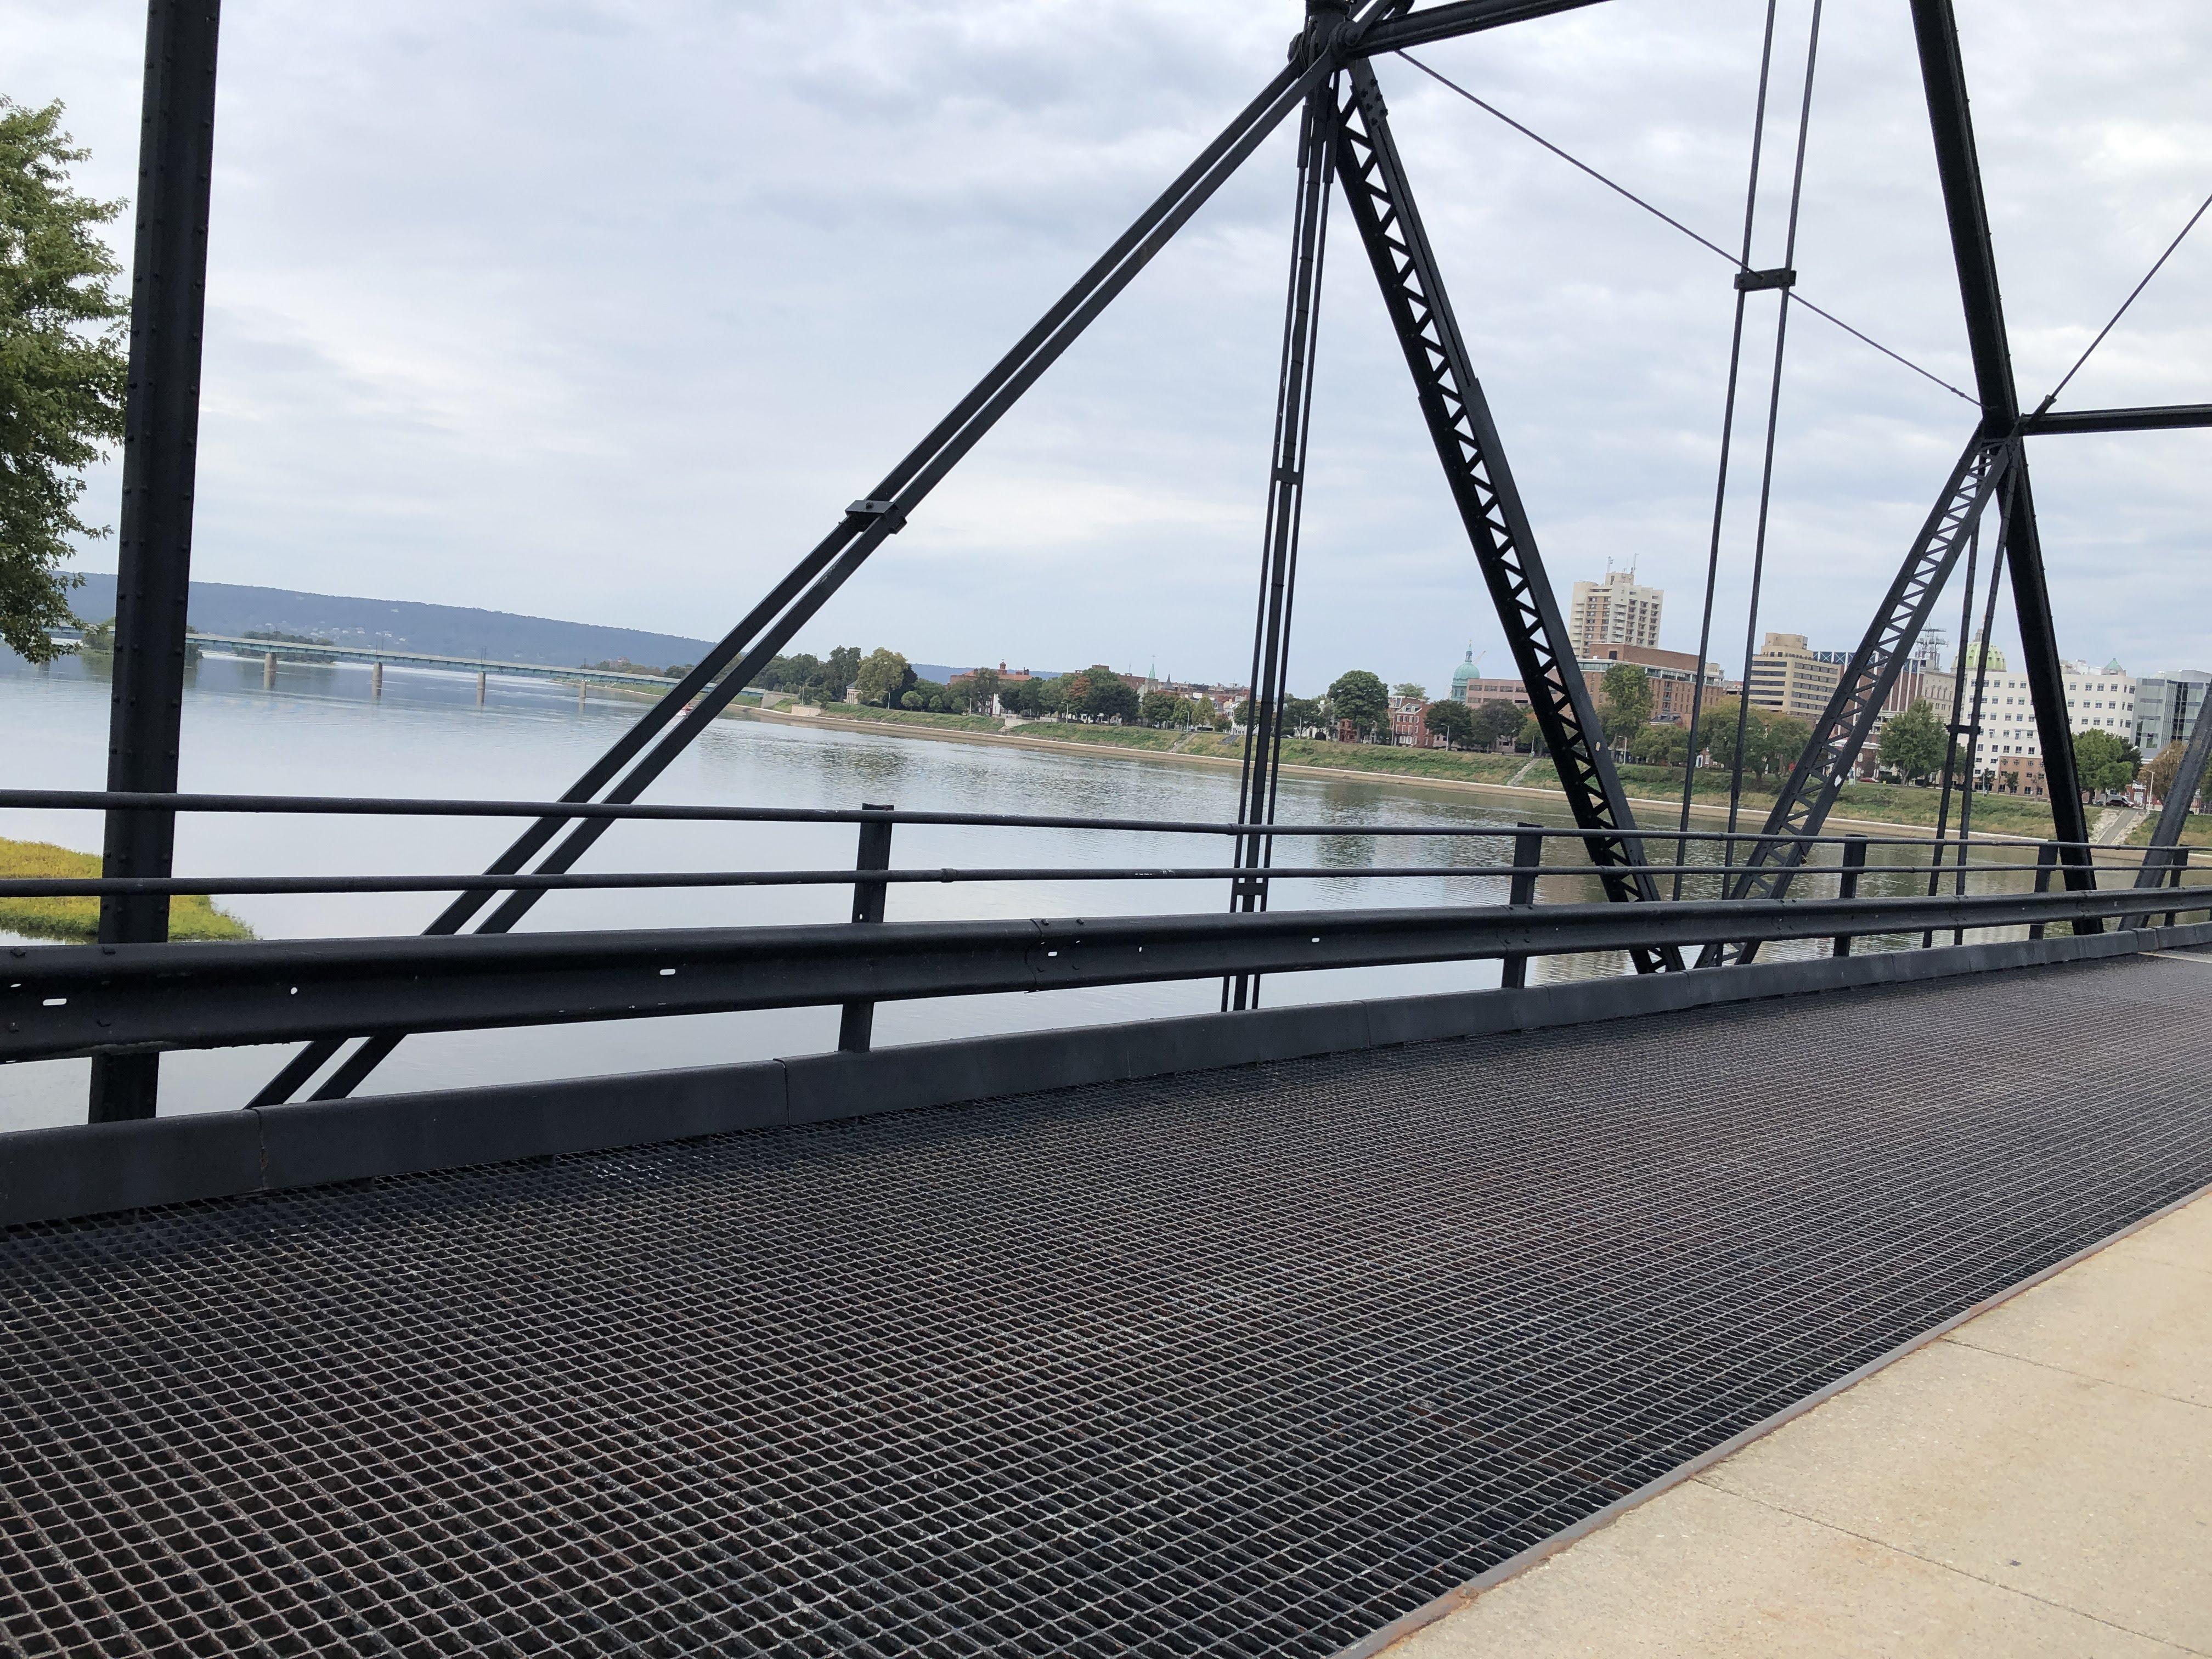 Walnut Street (pedestrian) Bridge, with Harvey Taylor Bridge in the background, Susquehanna River